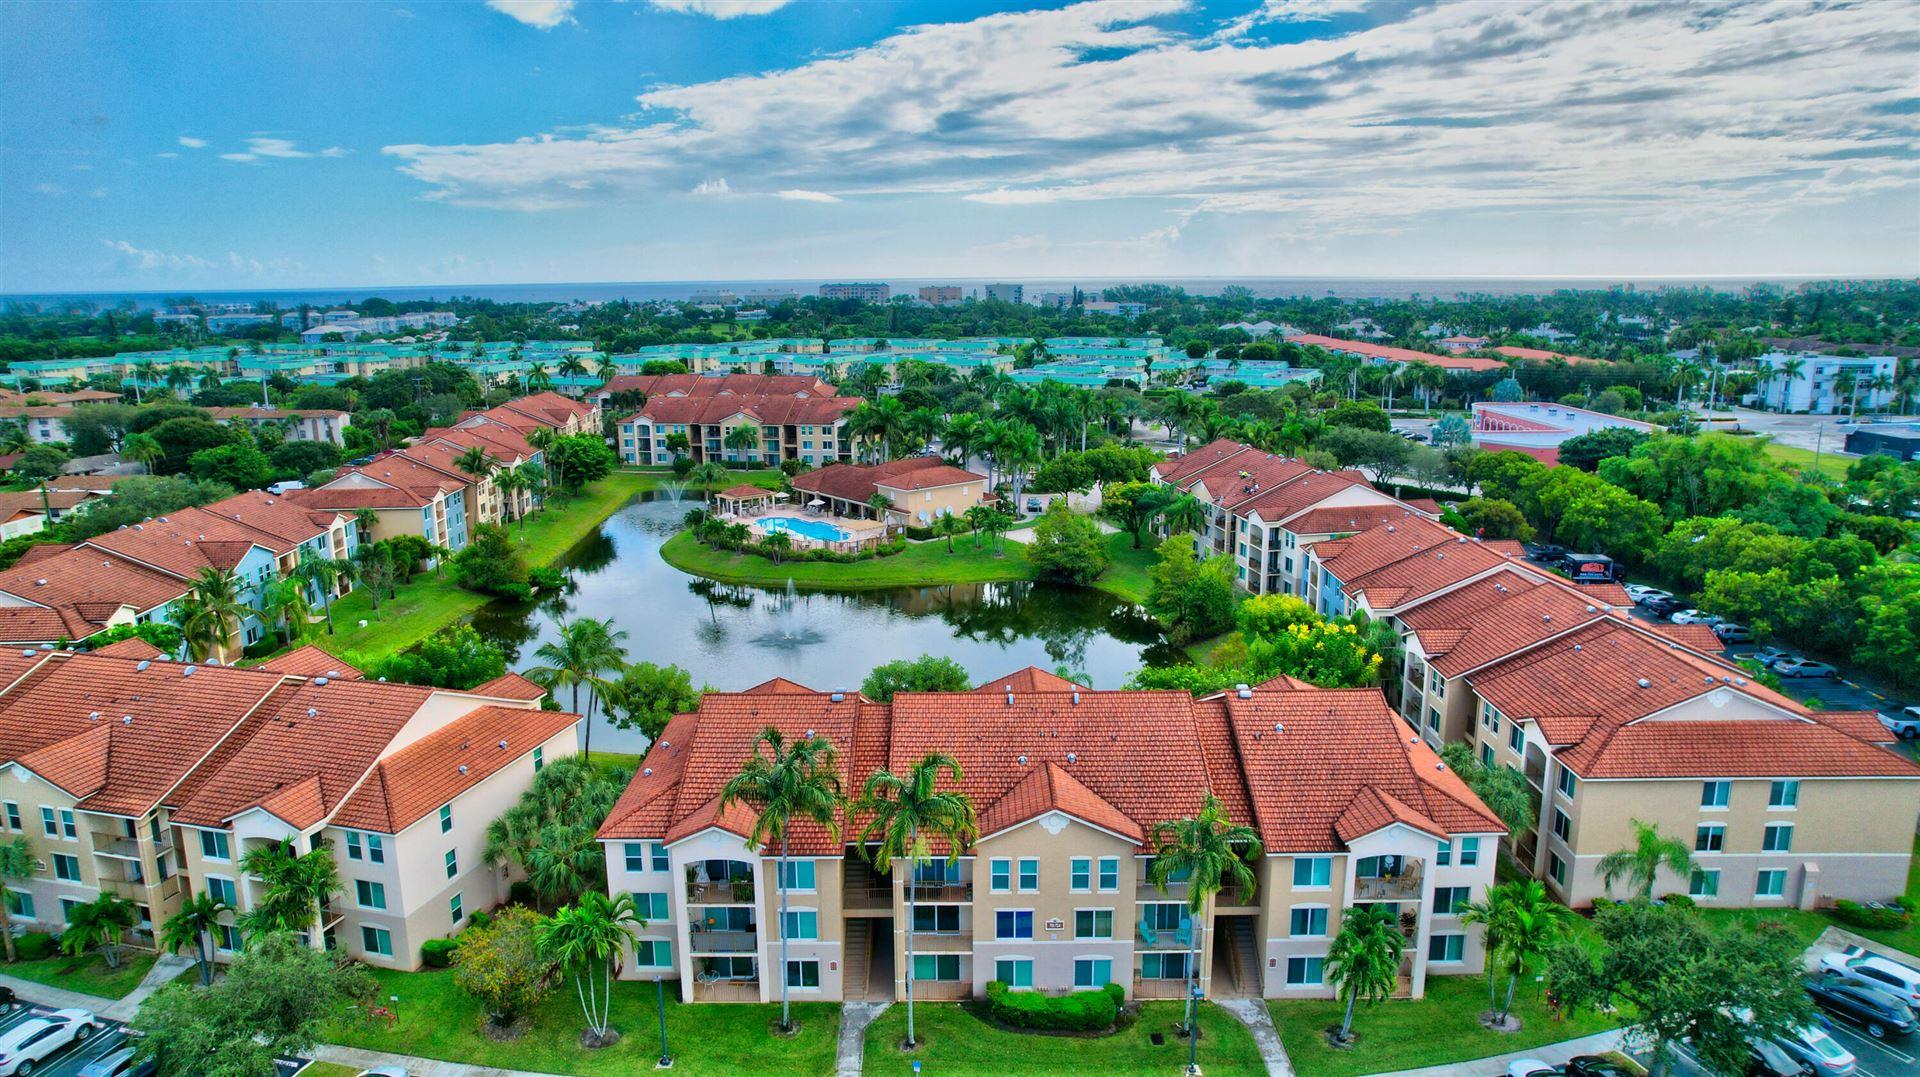 712 Villa Circle, Boynton Beach, FL 33435 - #: RX-10751996